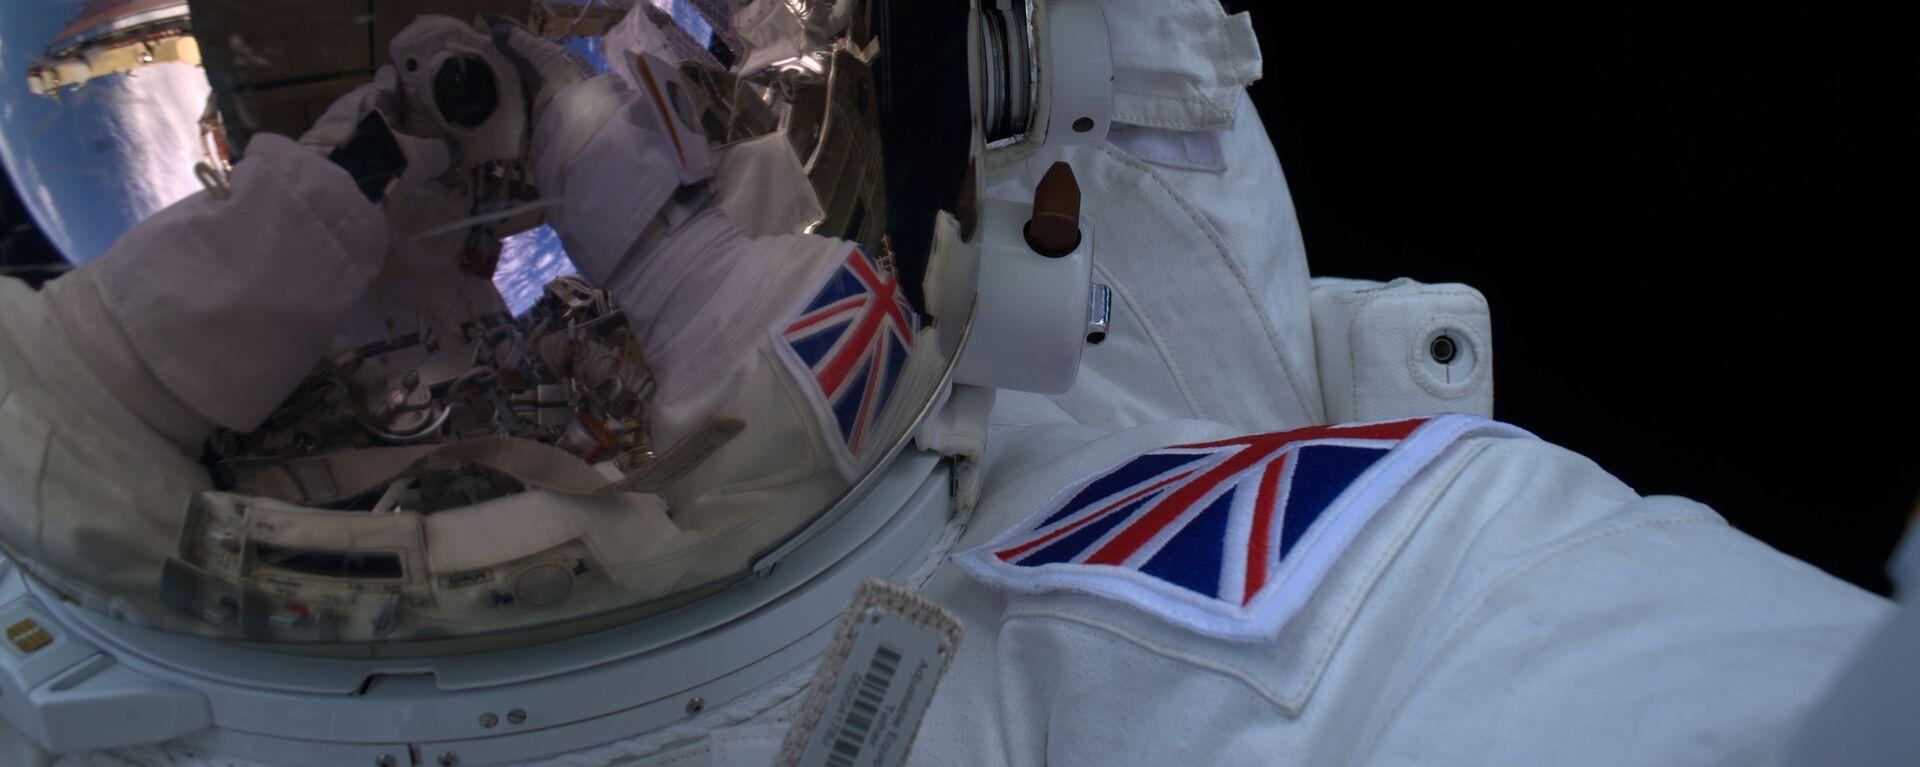 Astronauta britannico Tim Peake - Sputnik Italia, 1920, 27.09.2021